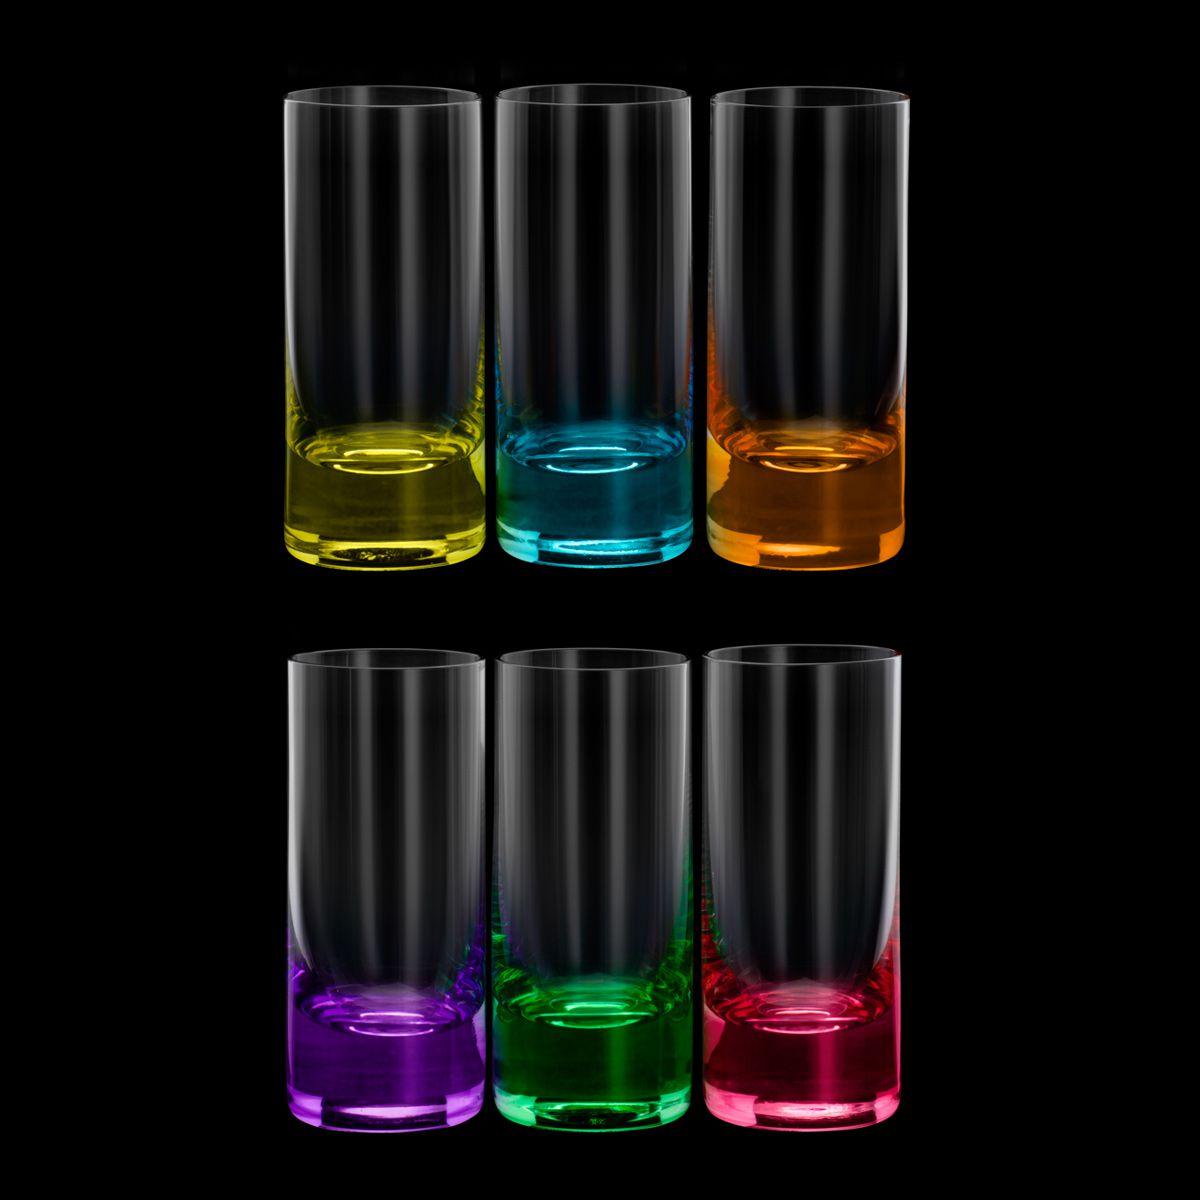 Jogo 6 copos 65ml para shot de cristal ecológico colorido Set-Bar Favorit Bohemia - 35027